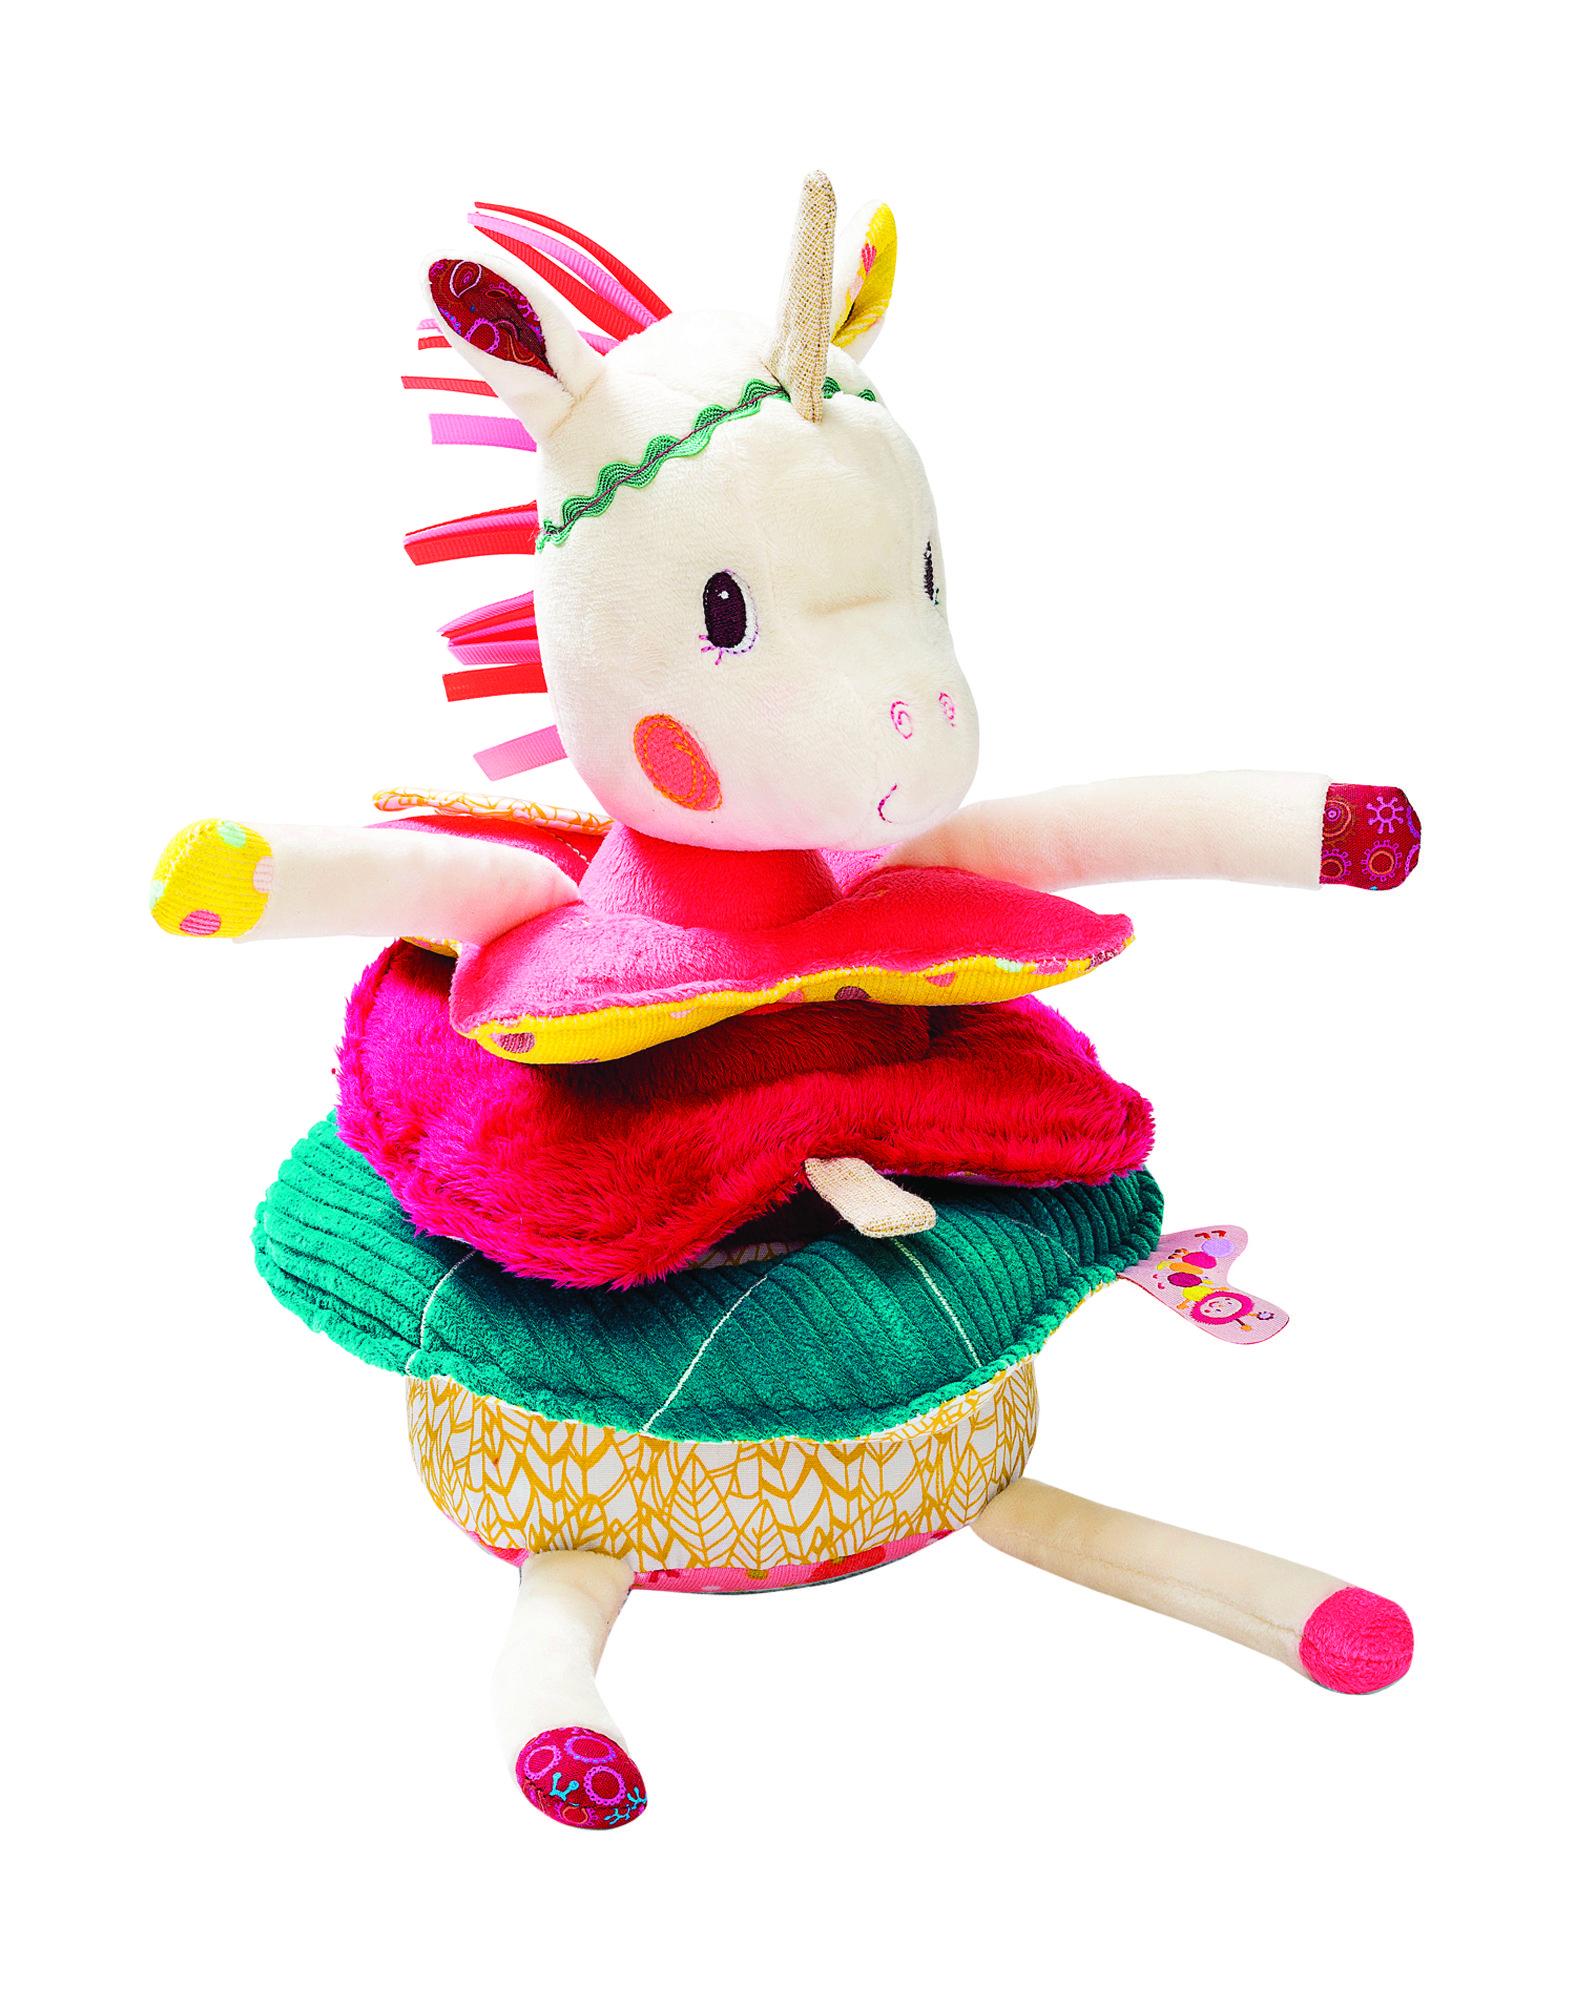 LILLIPUTIENS Игрушки для малышей lilliputiens курочка офелия музыкальная игрушка